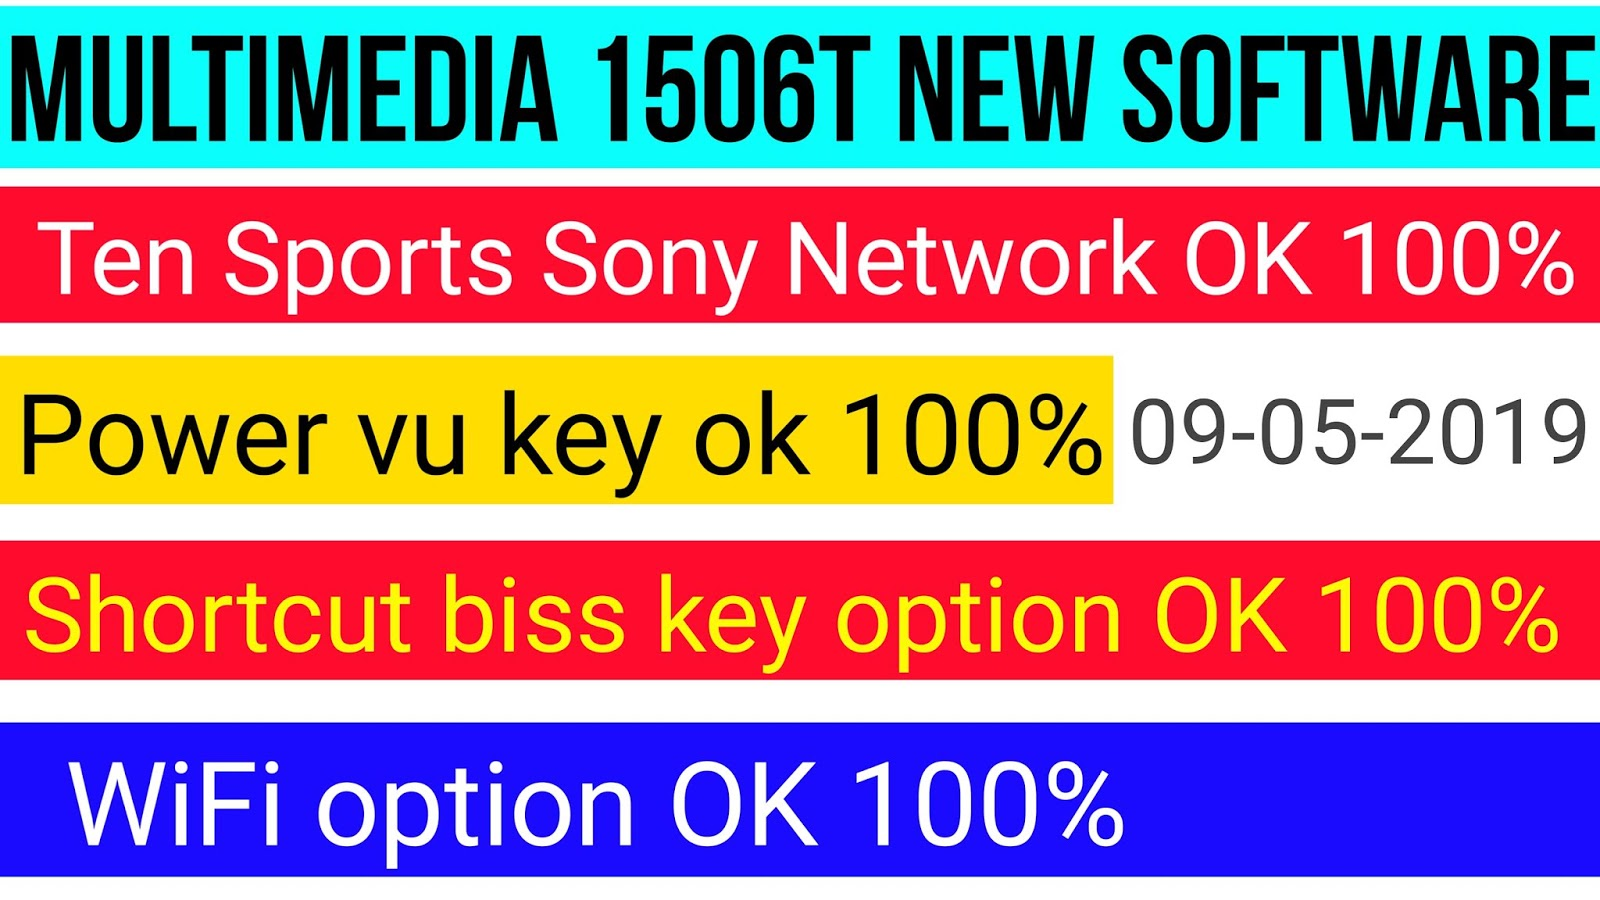 Multimedia 1506T New Power vu key Ten Sports OK With shortcut biss key Option